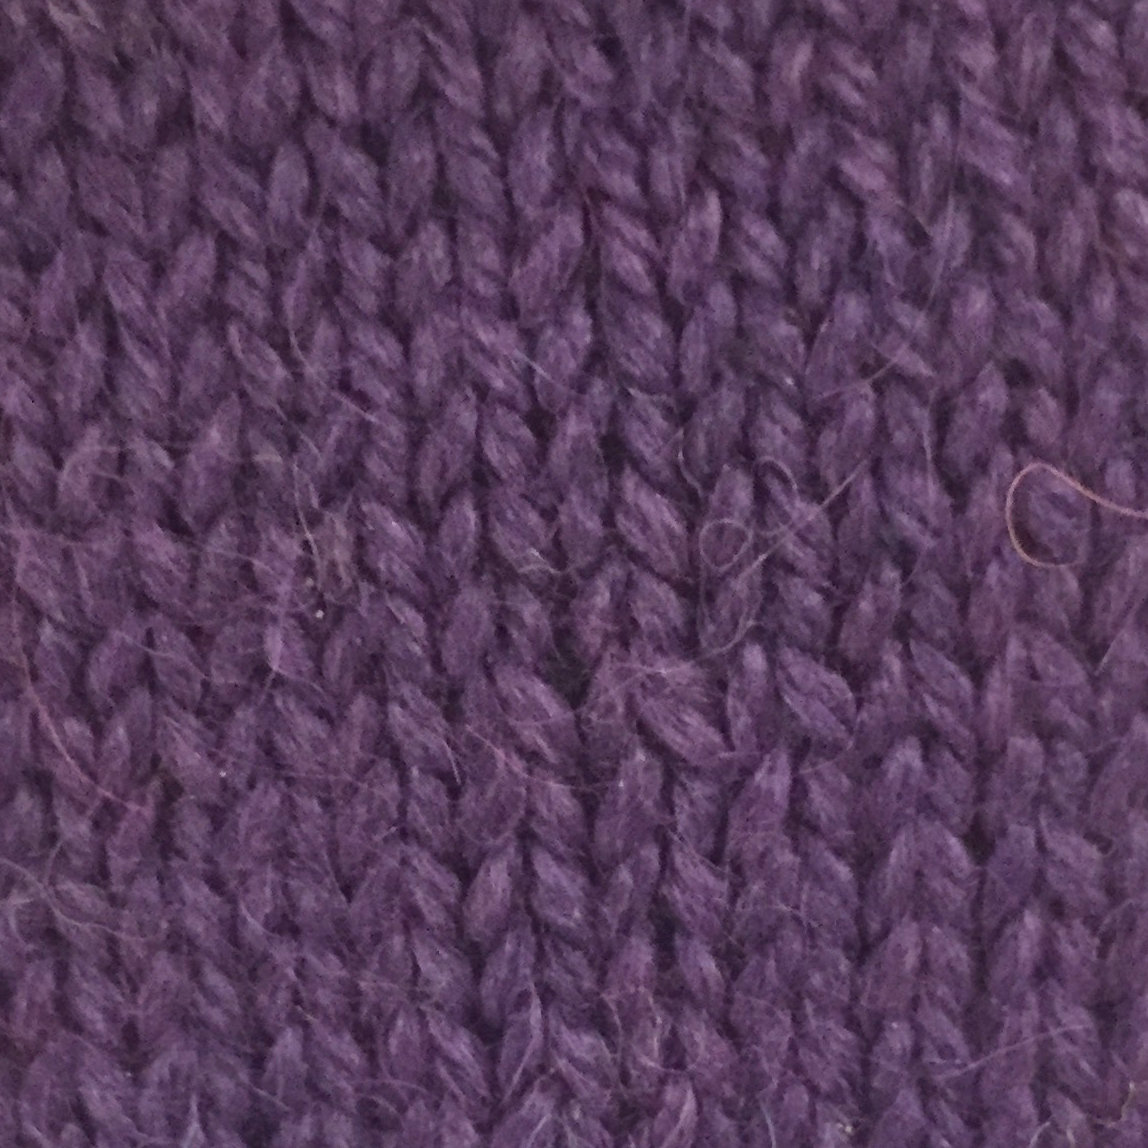 Snuggle Bulky Alpaca Blend Yarn - Majestic AYC-6800